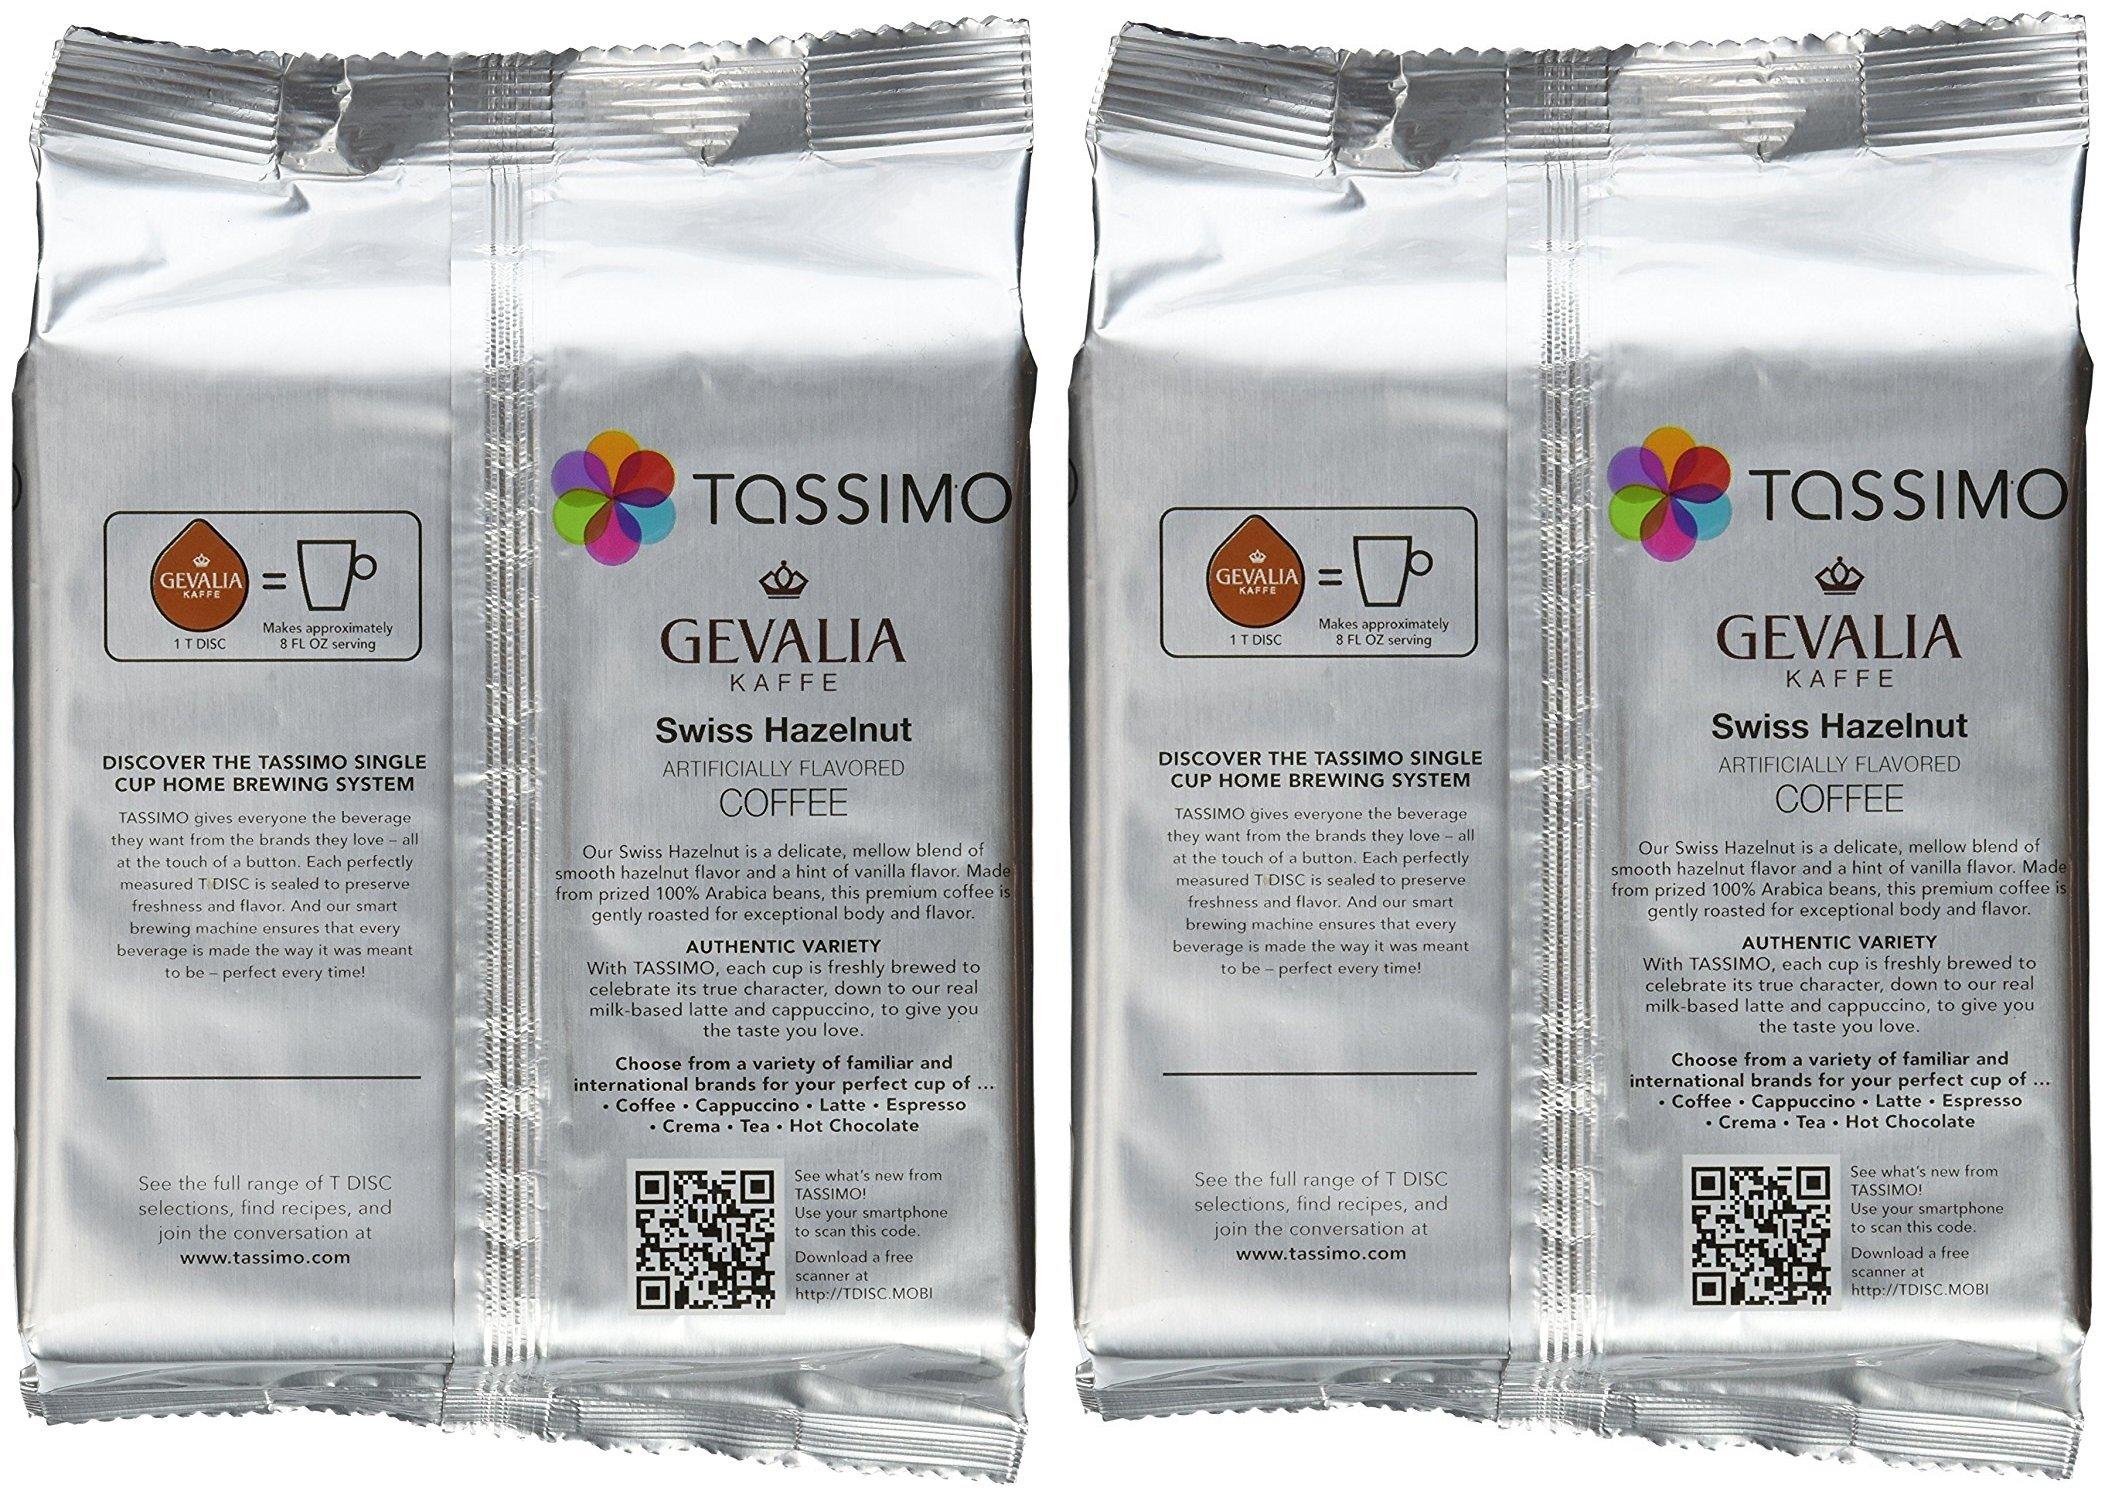 Tassimo Gevalia Kaffe Swiss Hazelnut Coffee T-Discs, 32 Count